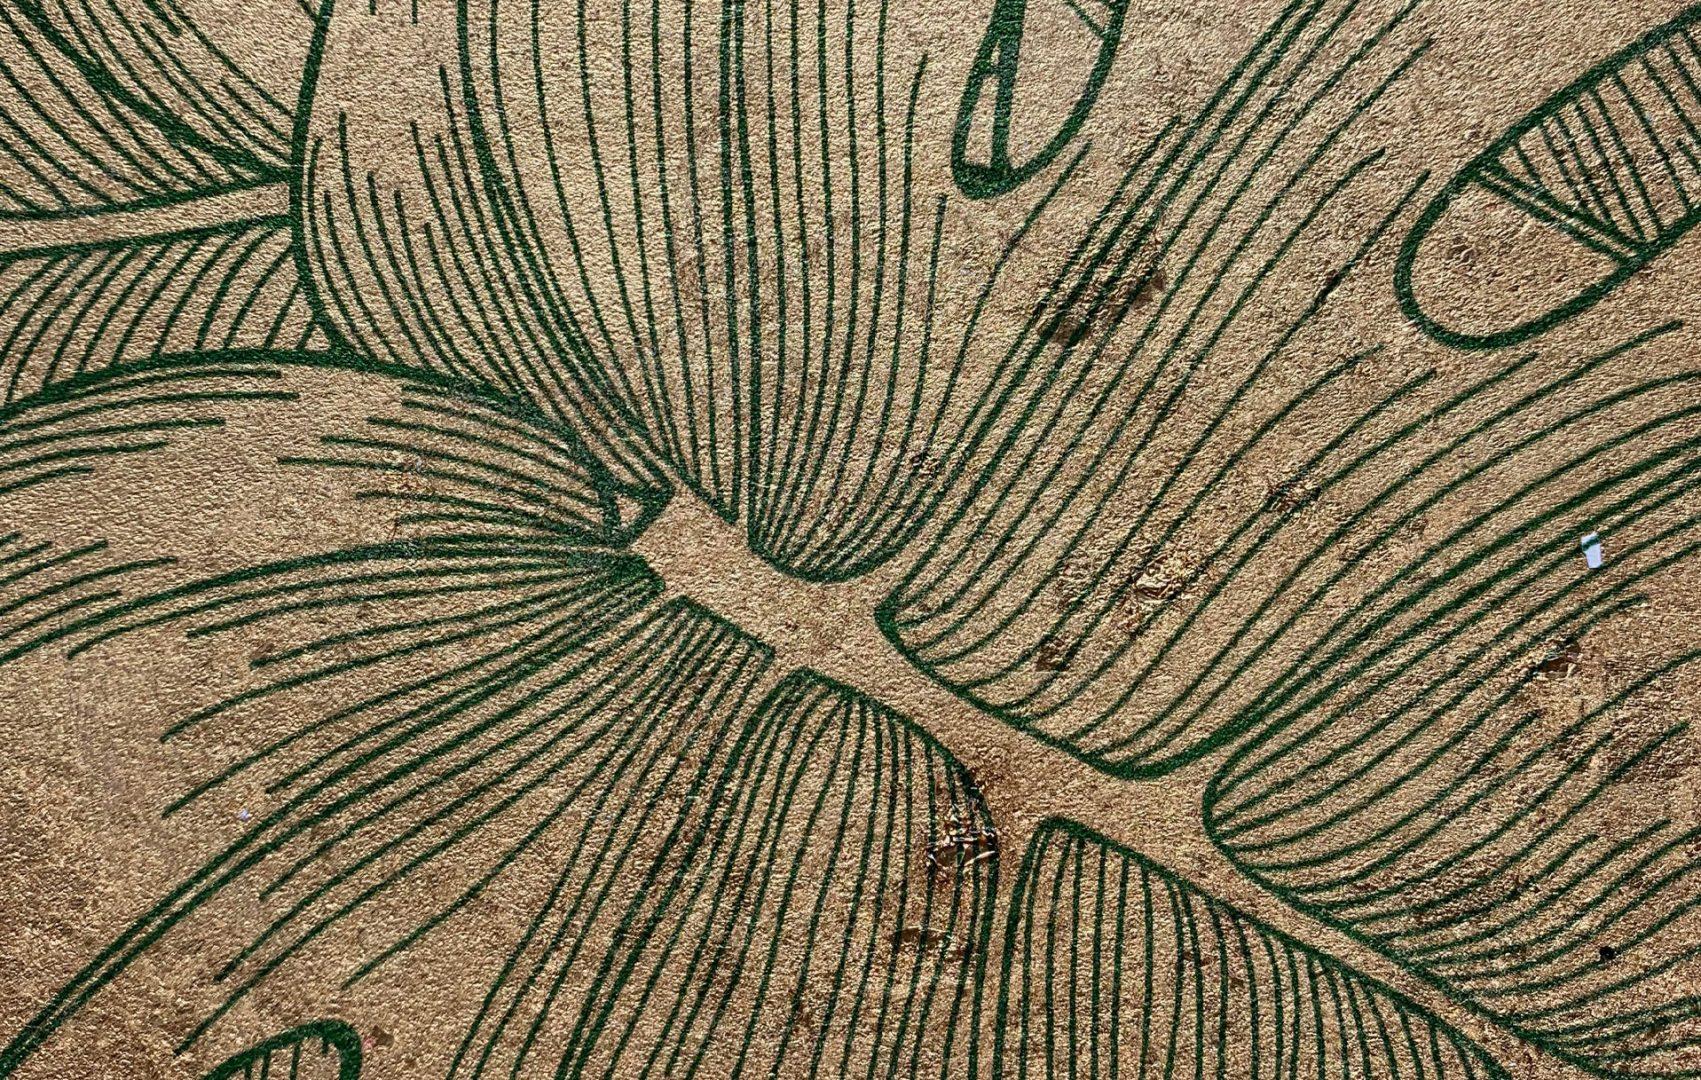 grenn-palm-leaf on gilded paper